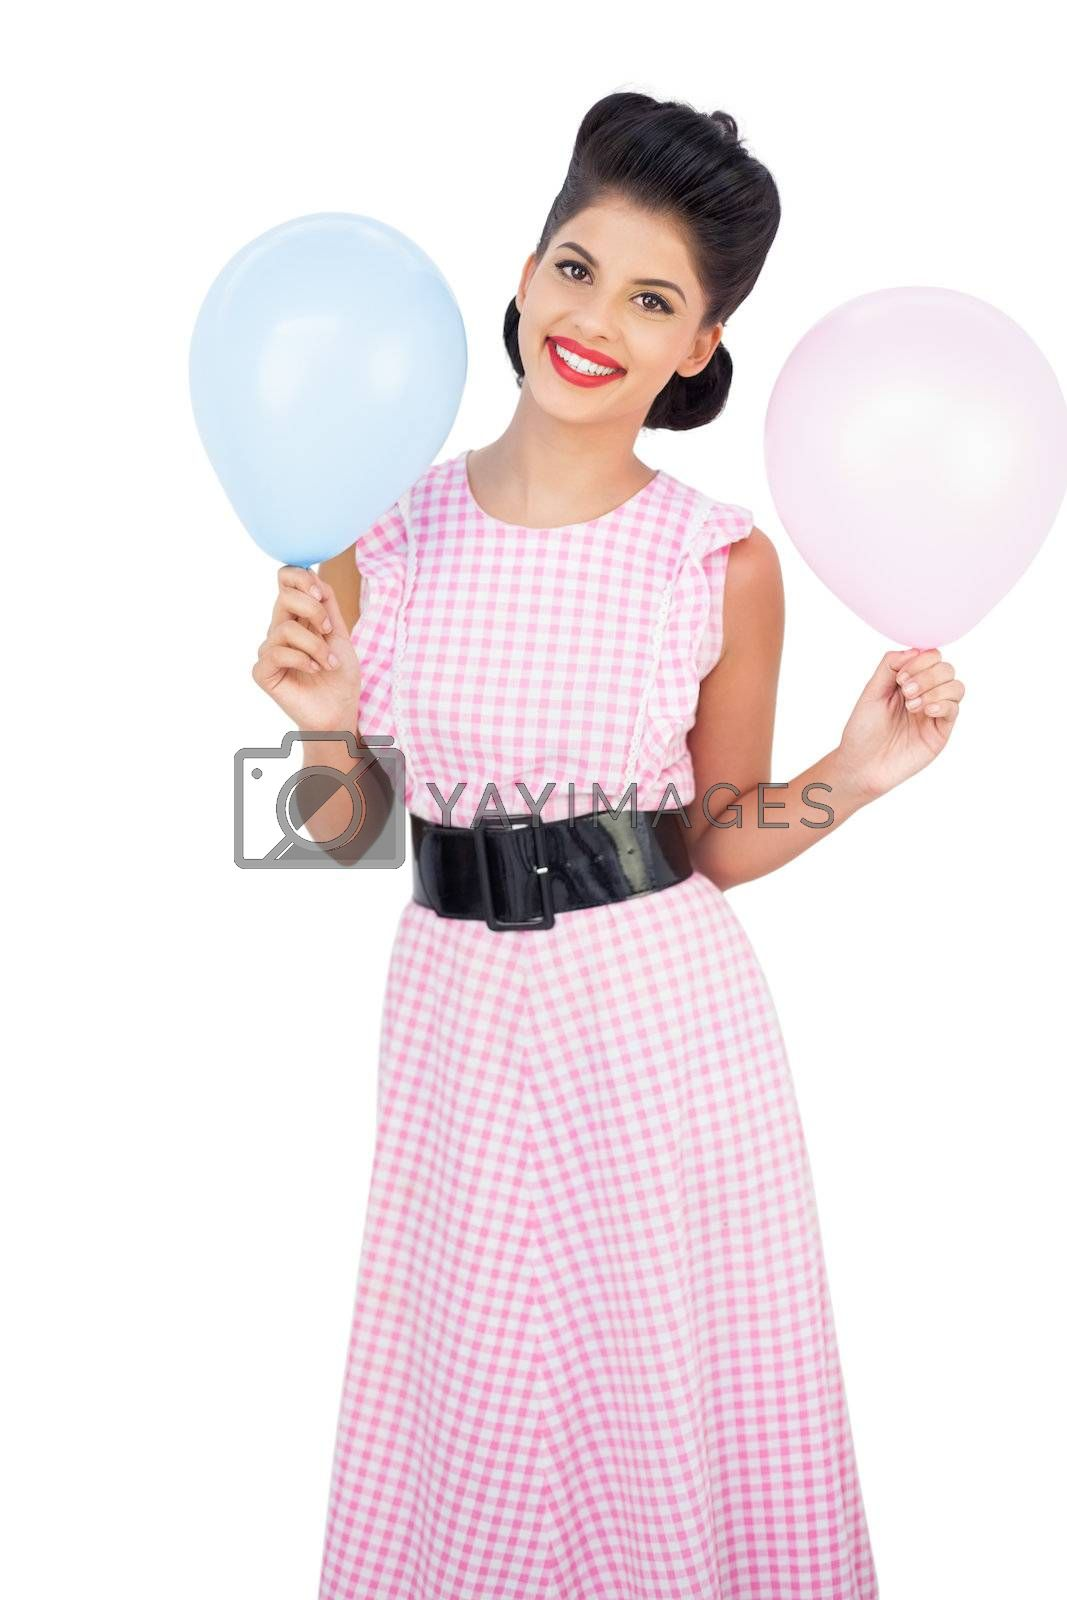 Cheerful black hair model holding balloons by Wavebreakmedia